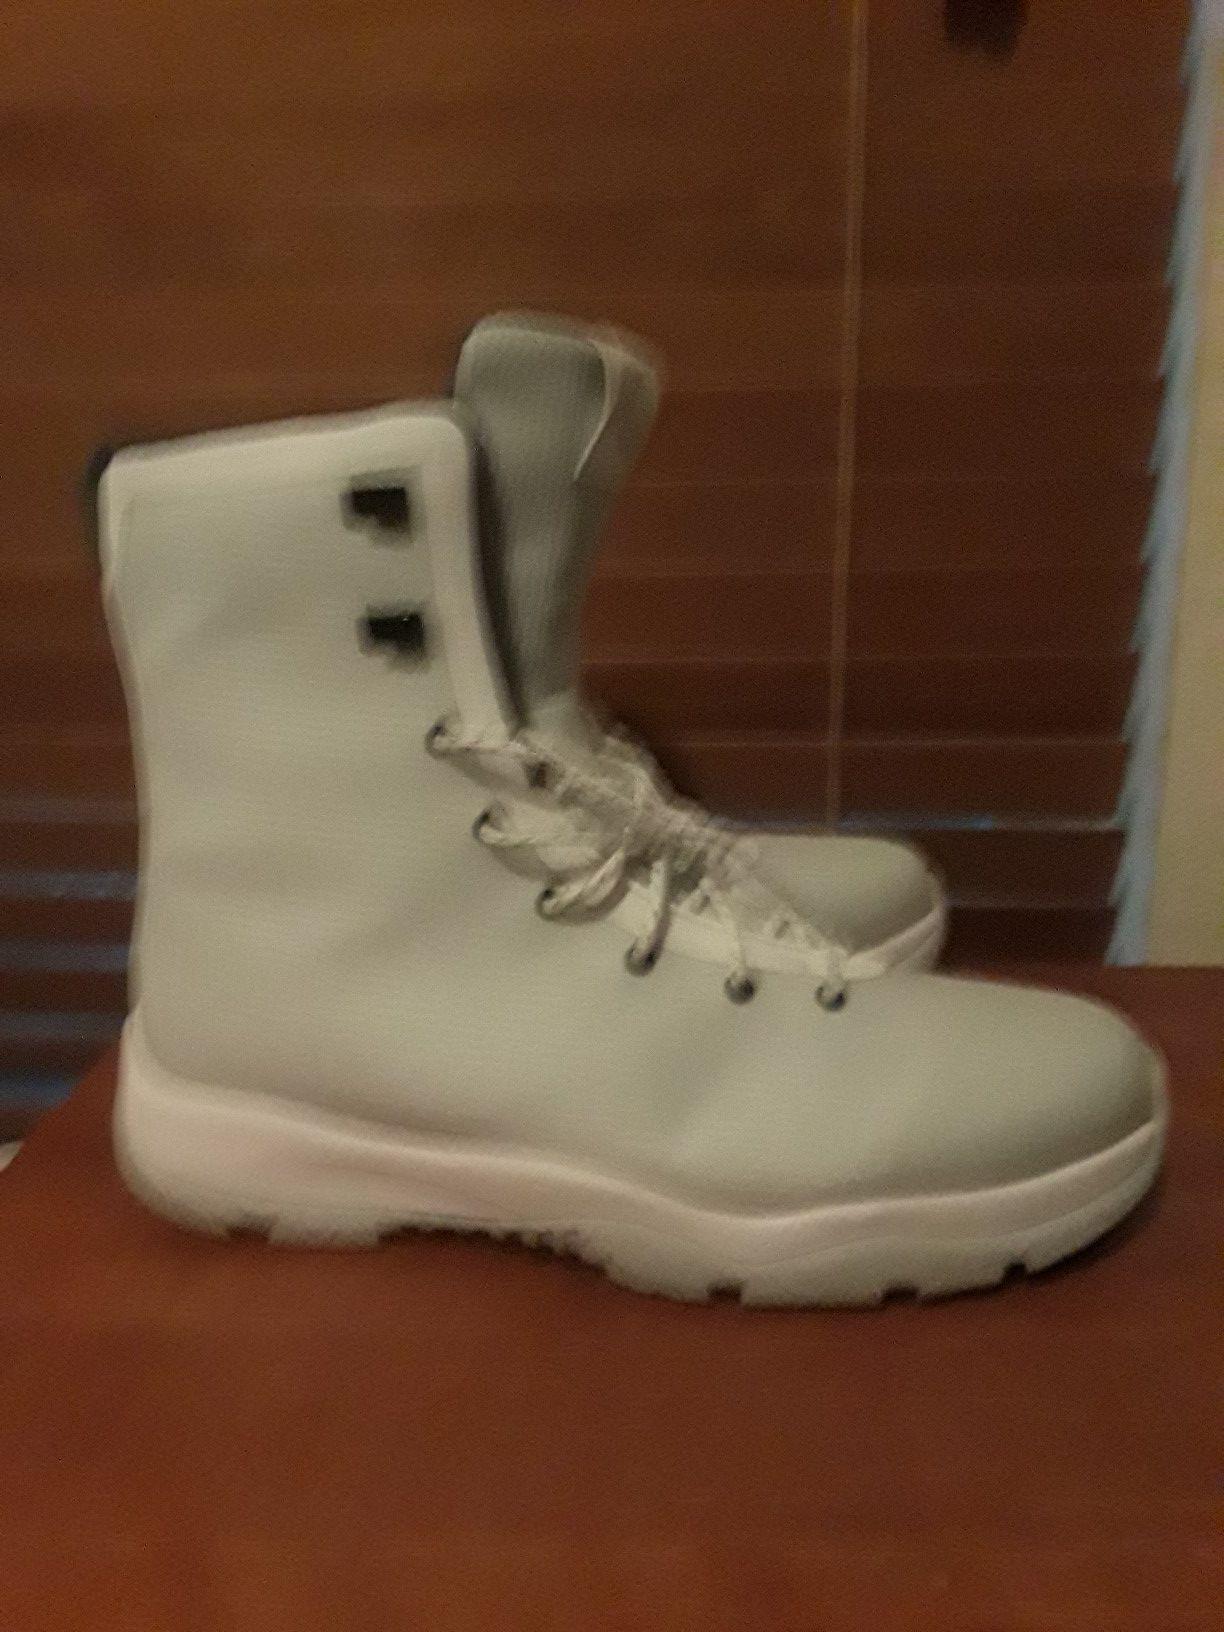 Authentic Jordan glossier boot